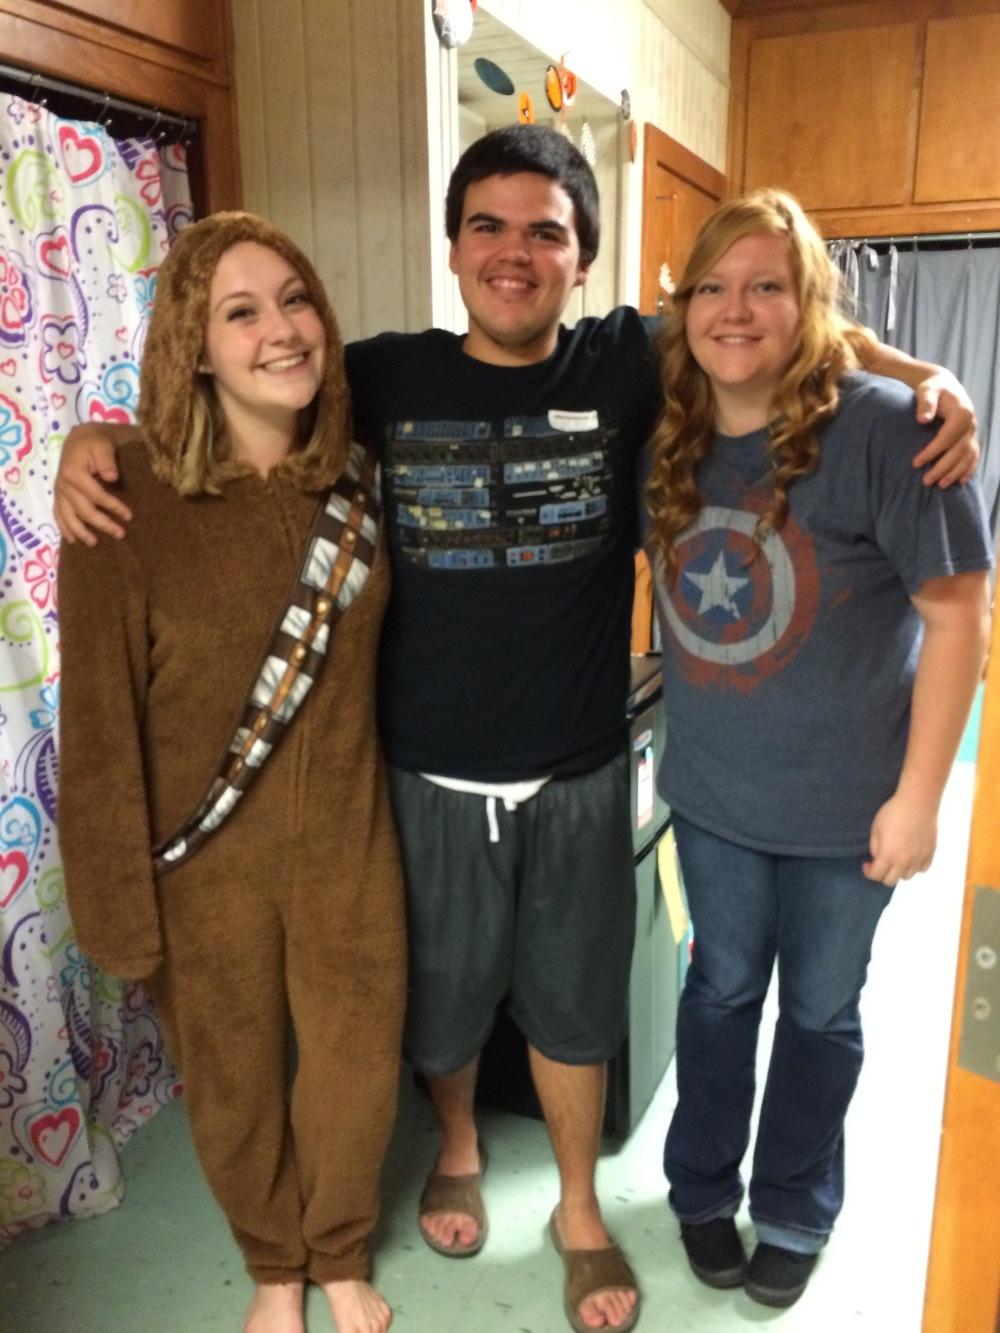 Jenna Thomas, Garrett Roberye and Rebekah Burrell experienced open dorm night in Emery.